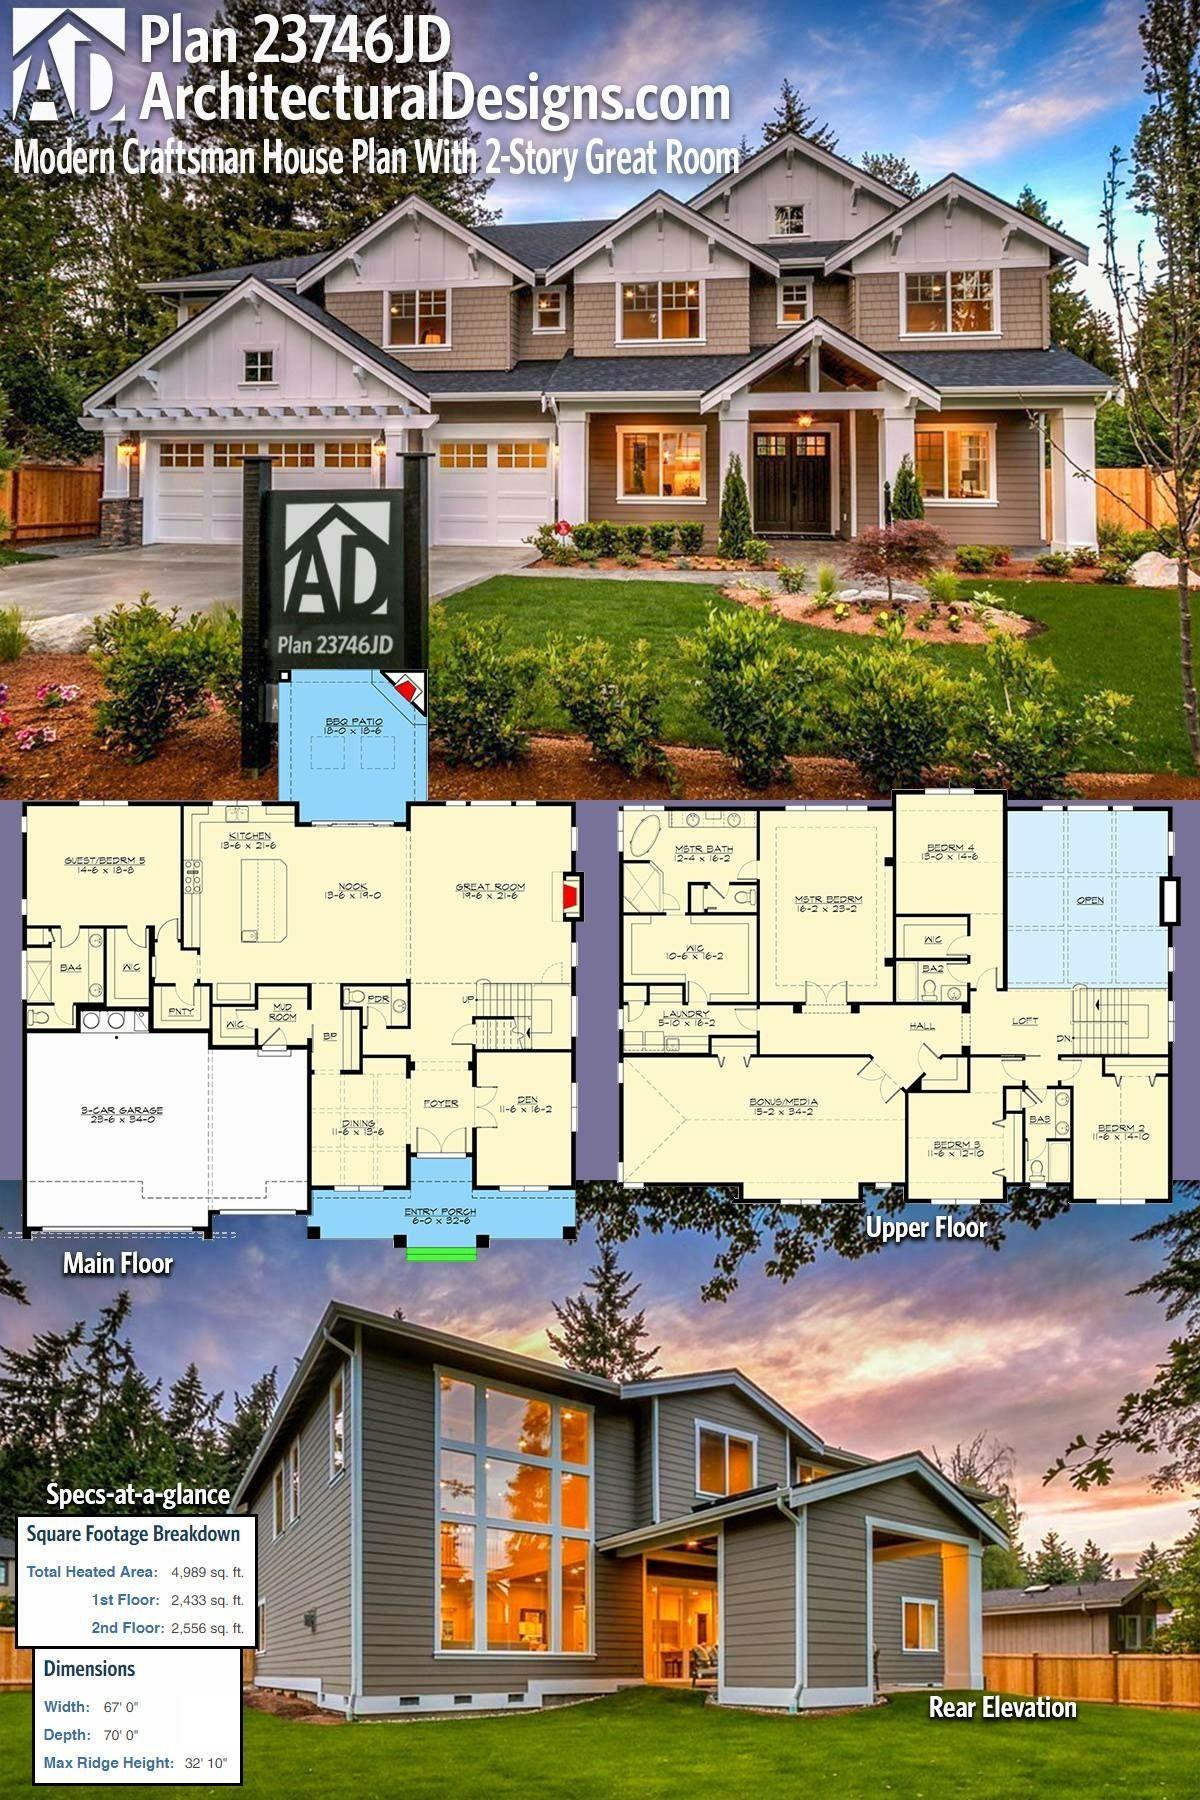 Architectural Designs Modern Craftsman House Plan gives